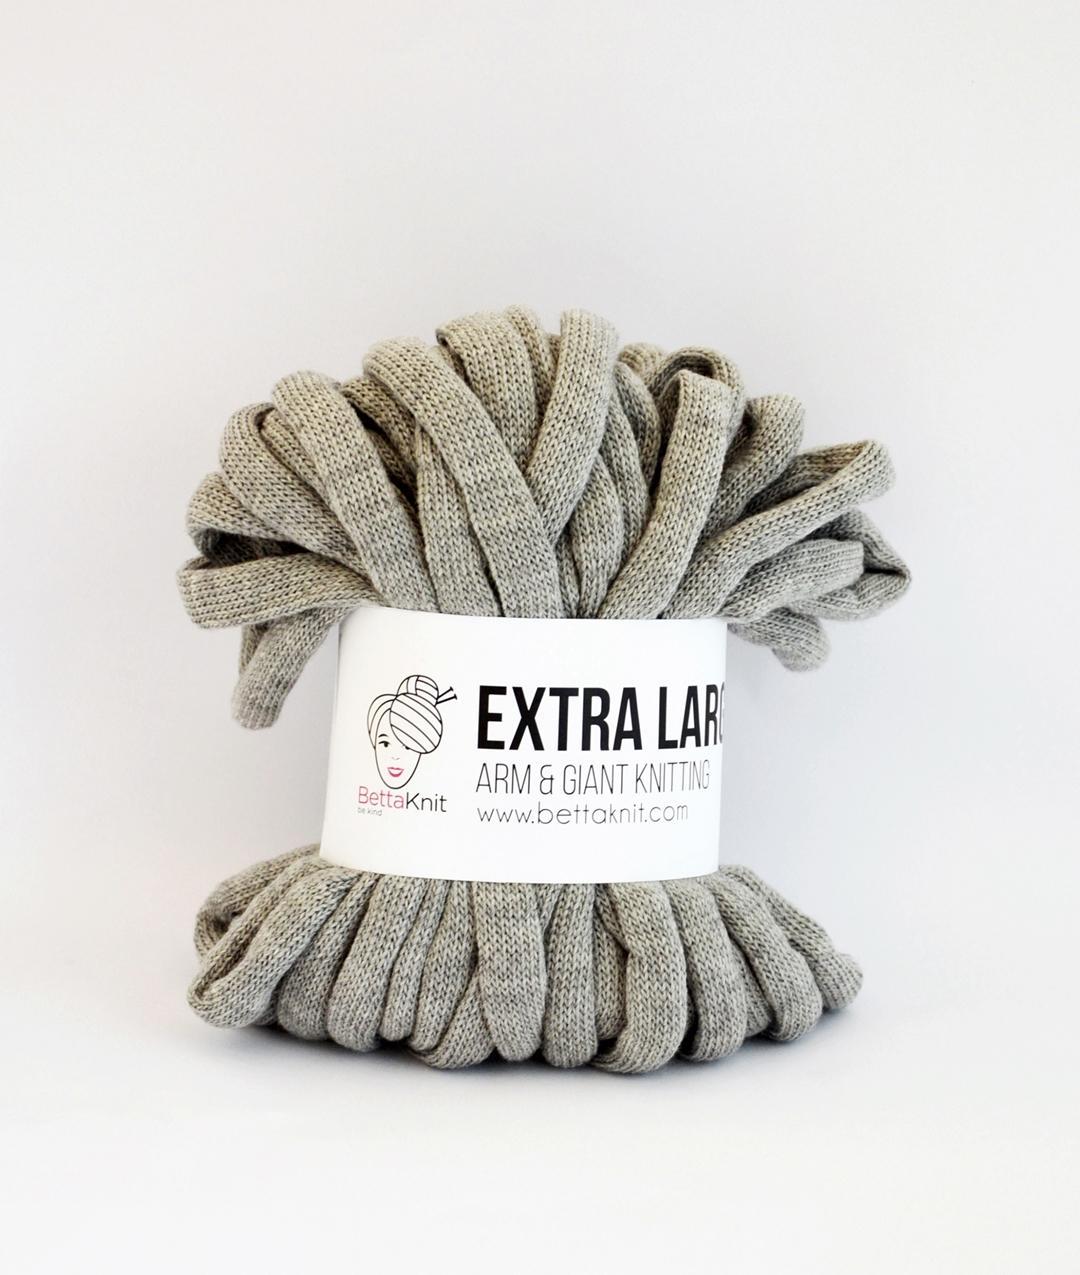 Betta Knit Giant Yarn.jpg